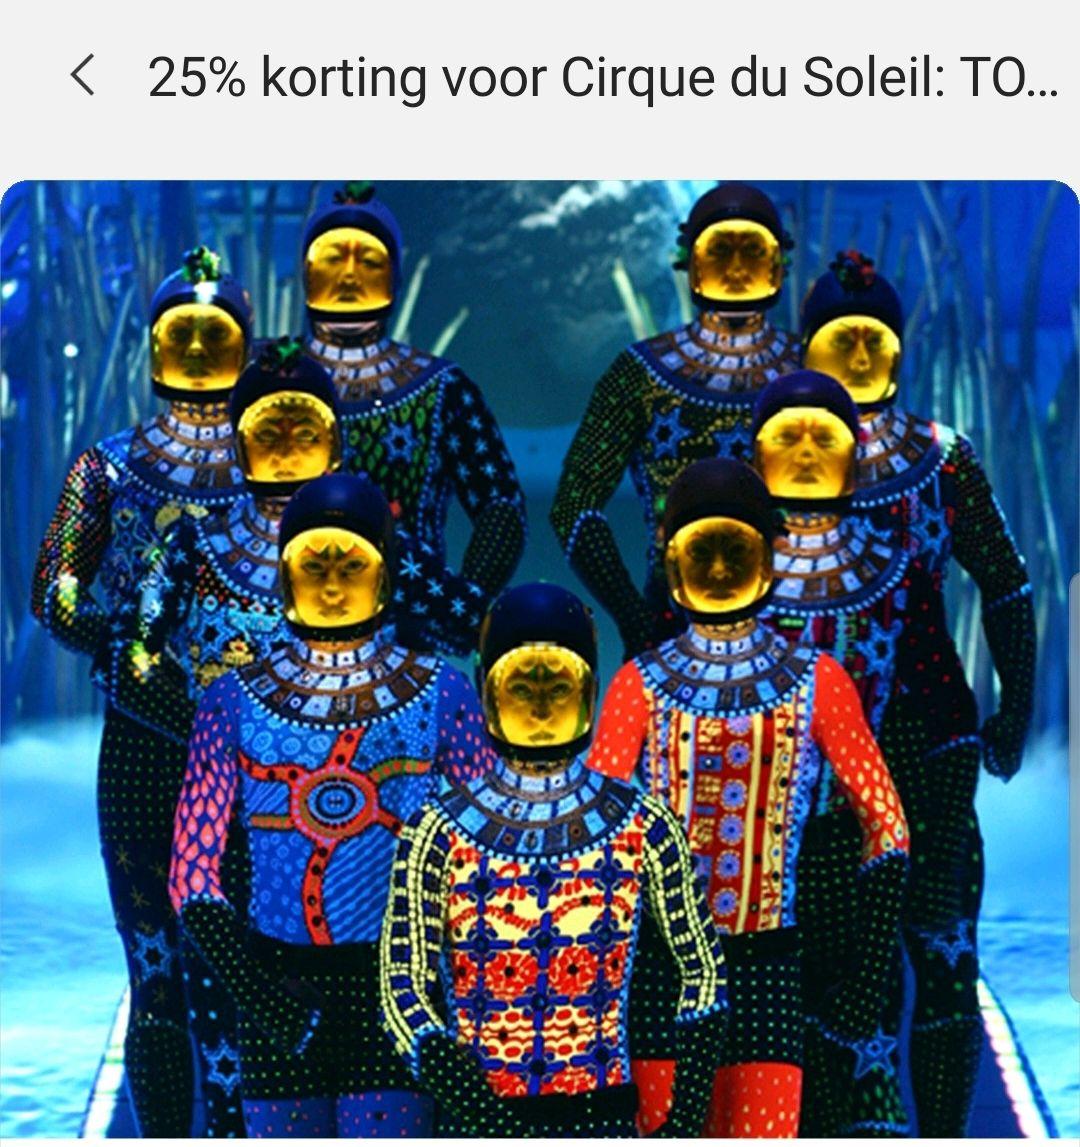 Samsung Member App: 25% korting Cirque de Soleil (geselecteerde data)